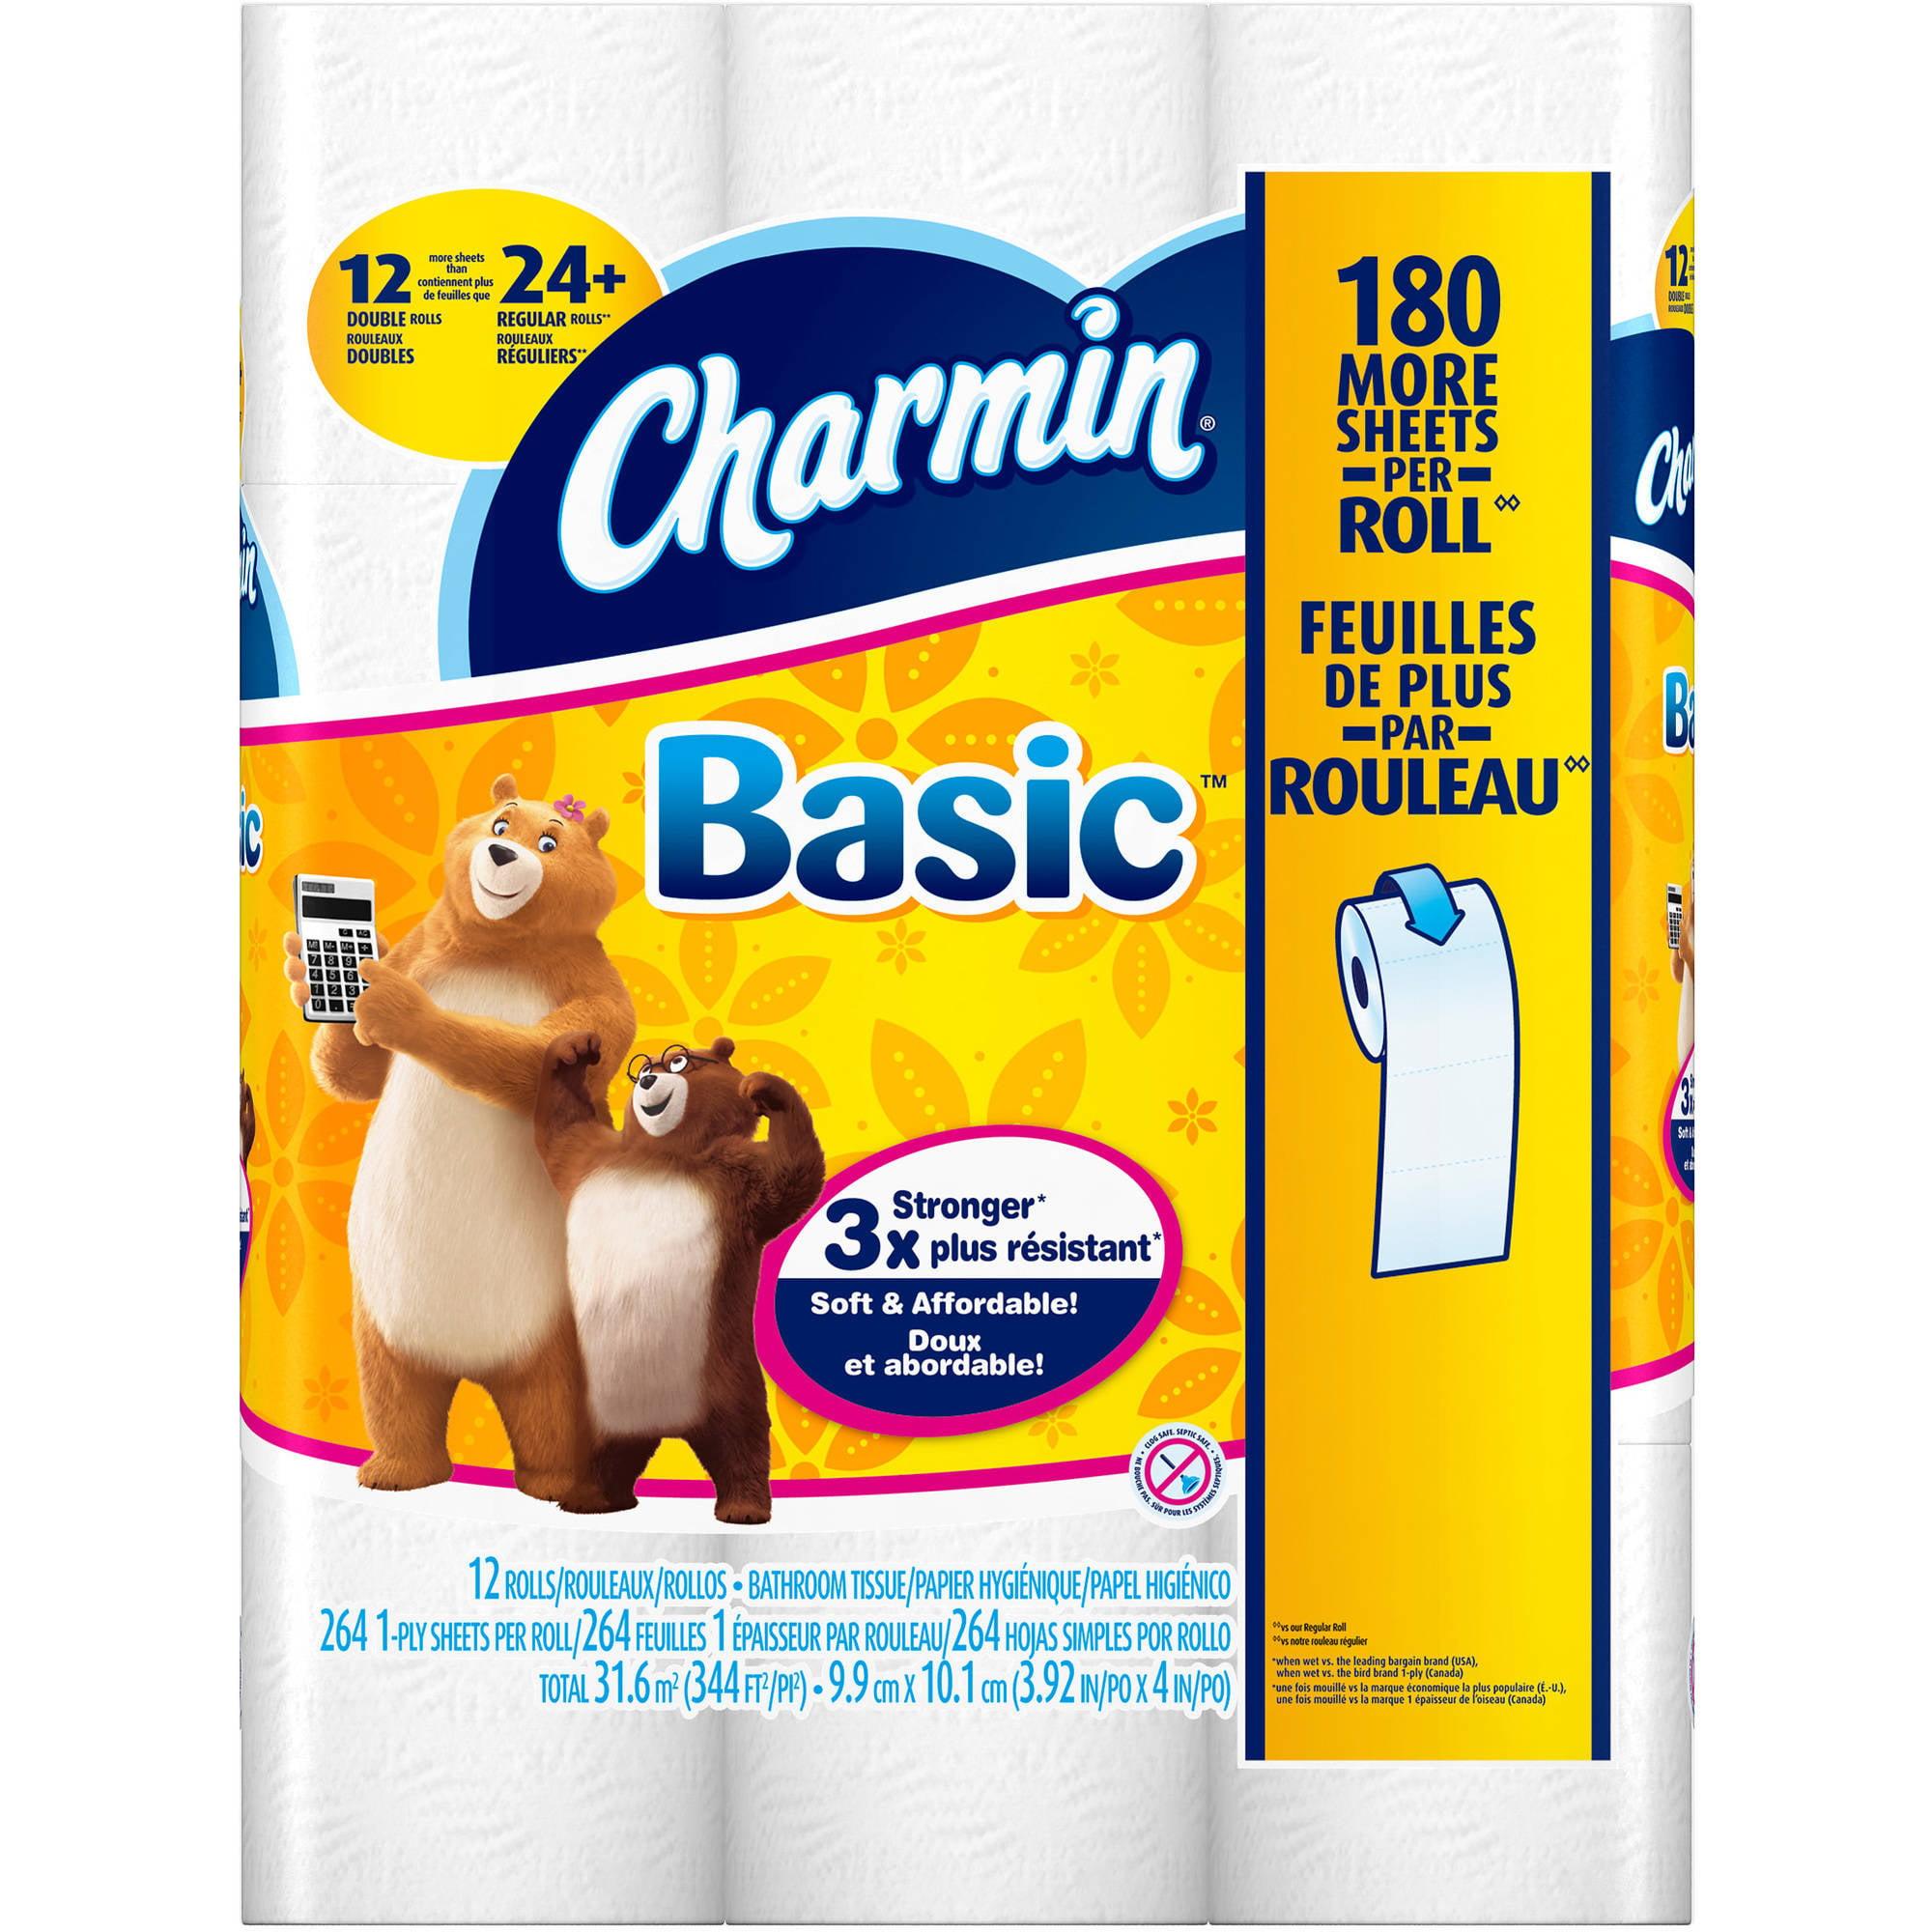 Charmin Basic Toilet Paper, 12 ct - Walmart.com